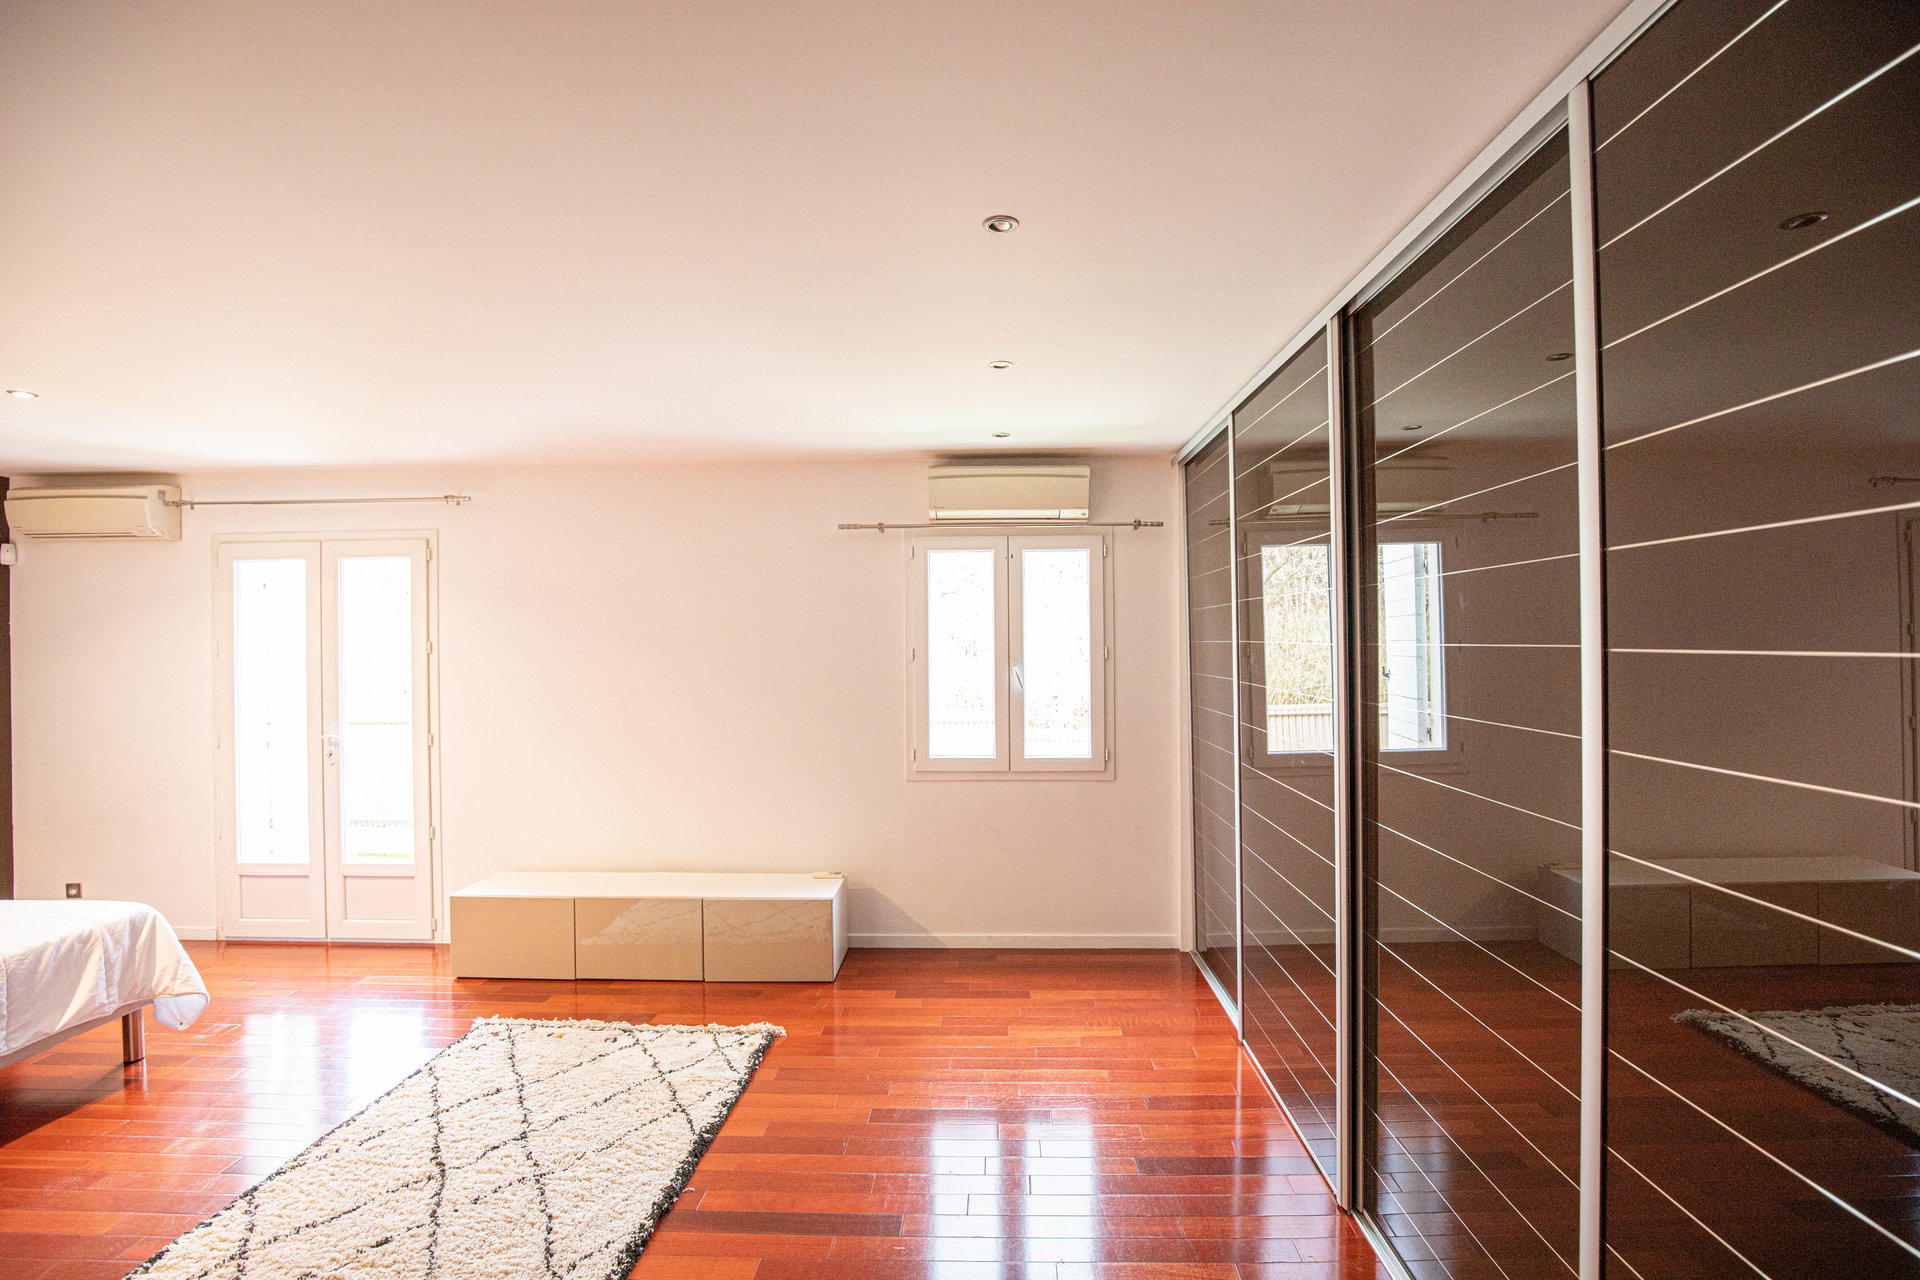 GREEN ALENTOURS - Villa T4 avec studio, jardin et piscine Allauch